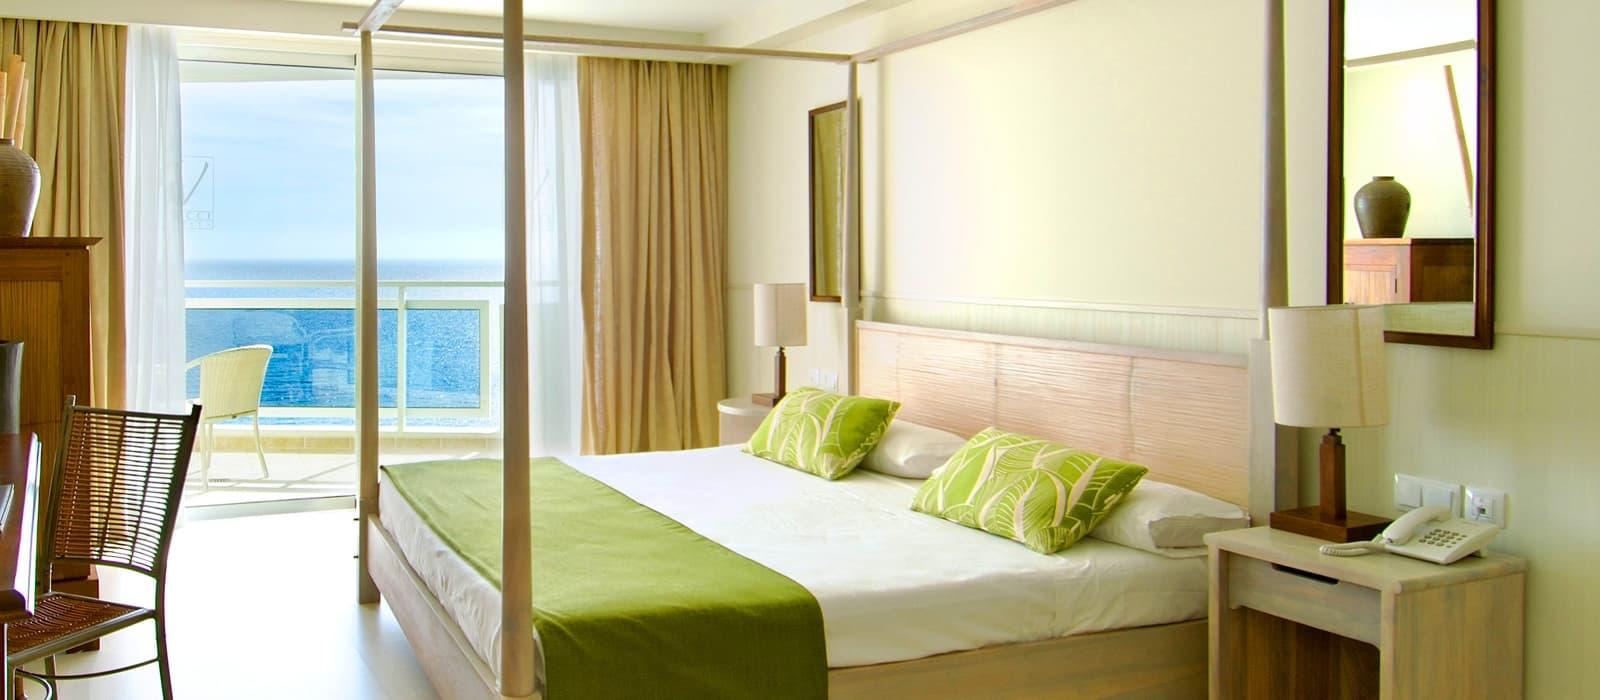 Tenerife Golf Hôtel - Vincci Hoteles